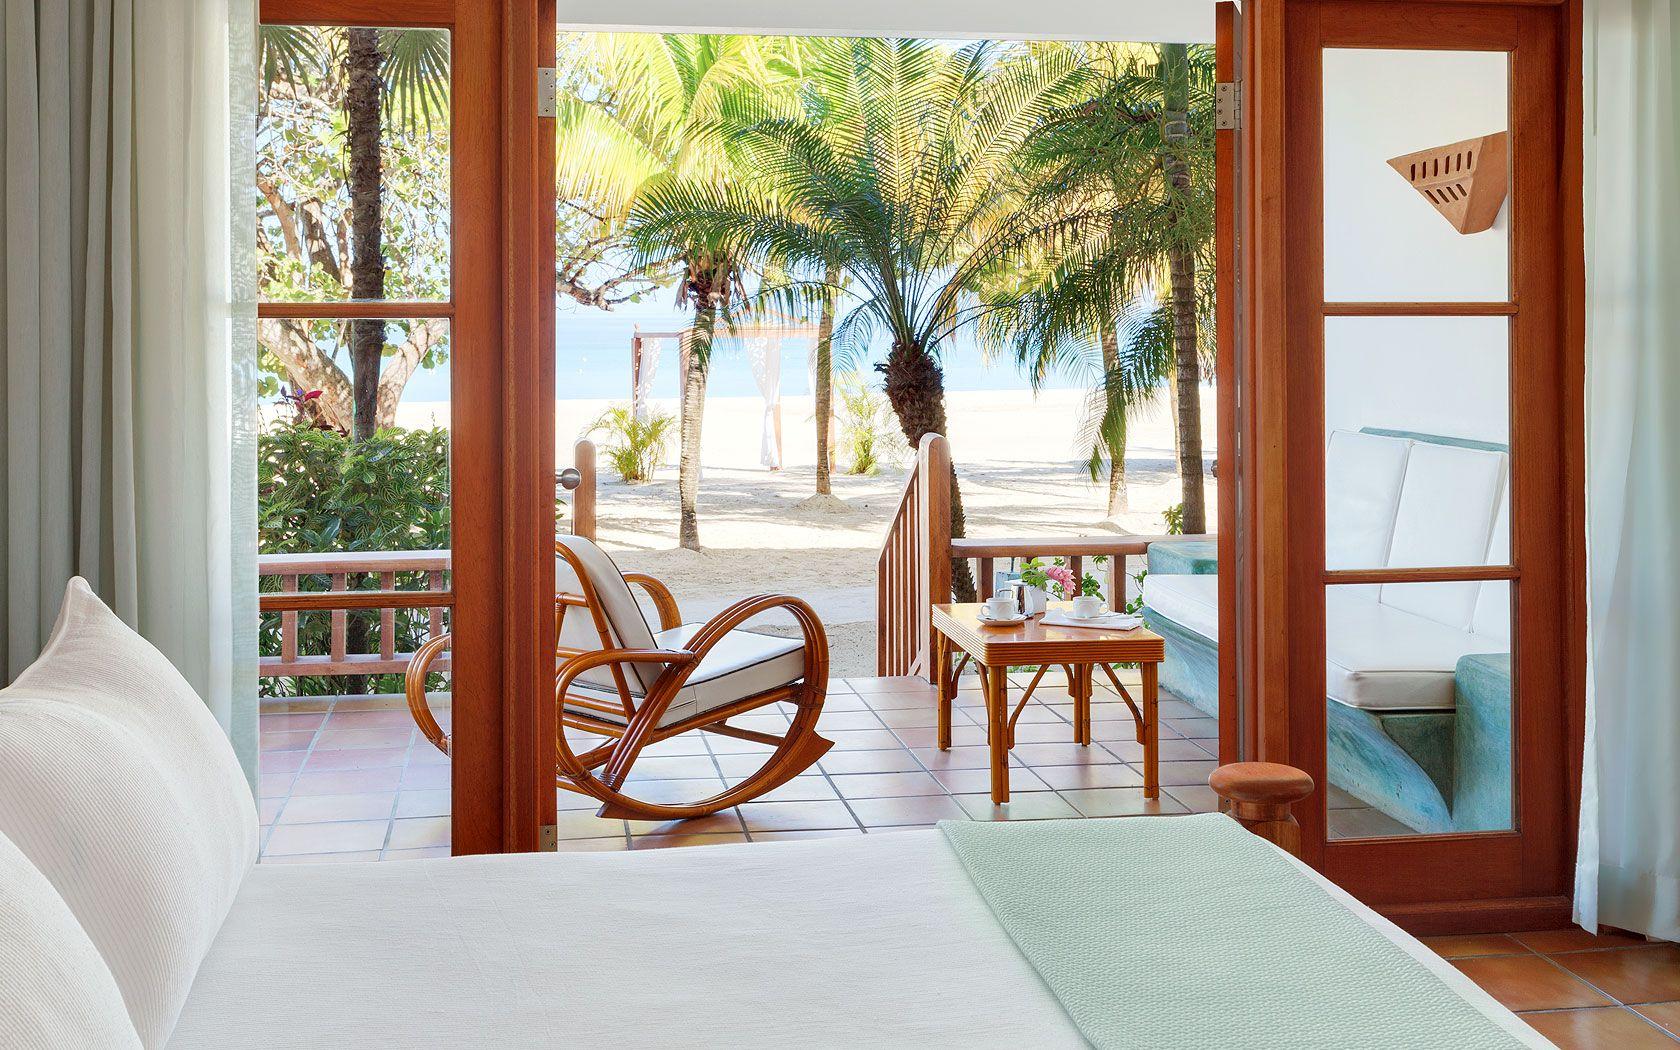 Couples Swept Away Caribbean Beachfront Suites Verandahs Couples Swept Away Best Resorts Jamaica Resorts